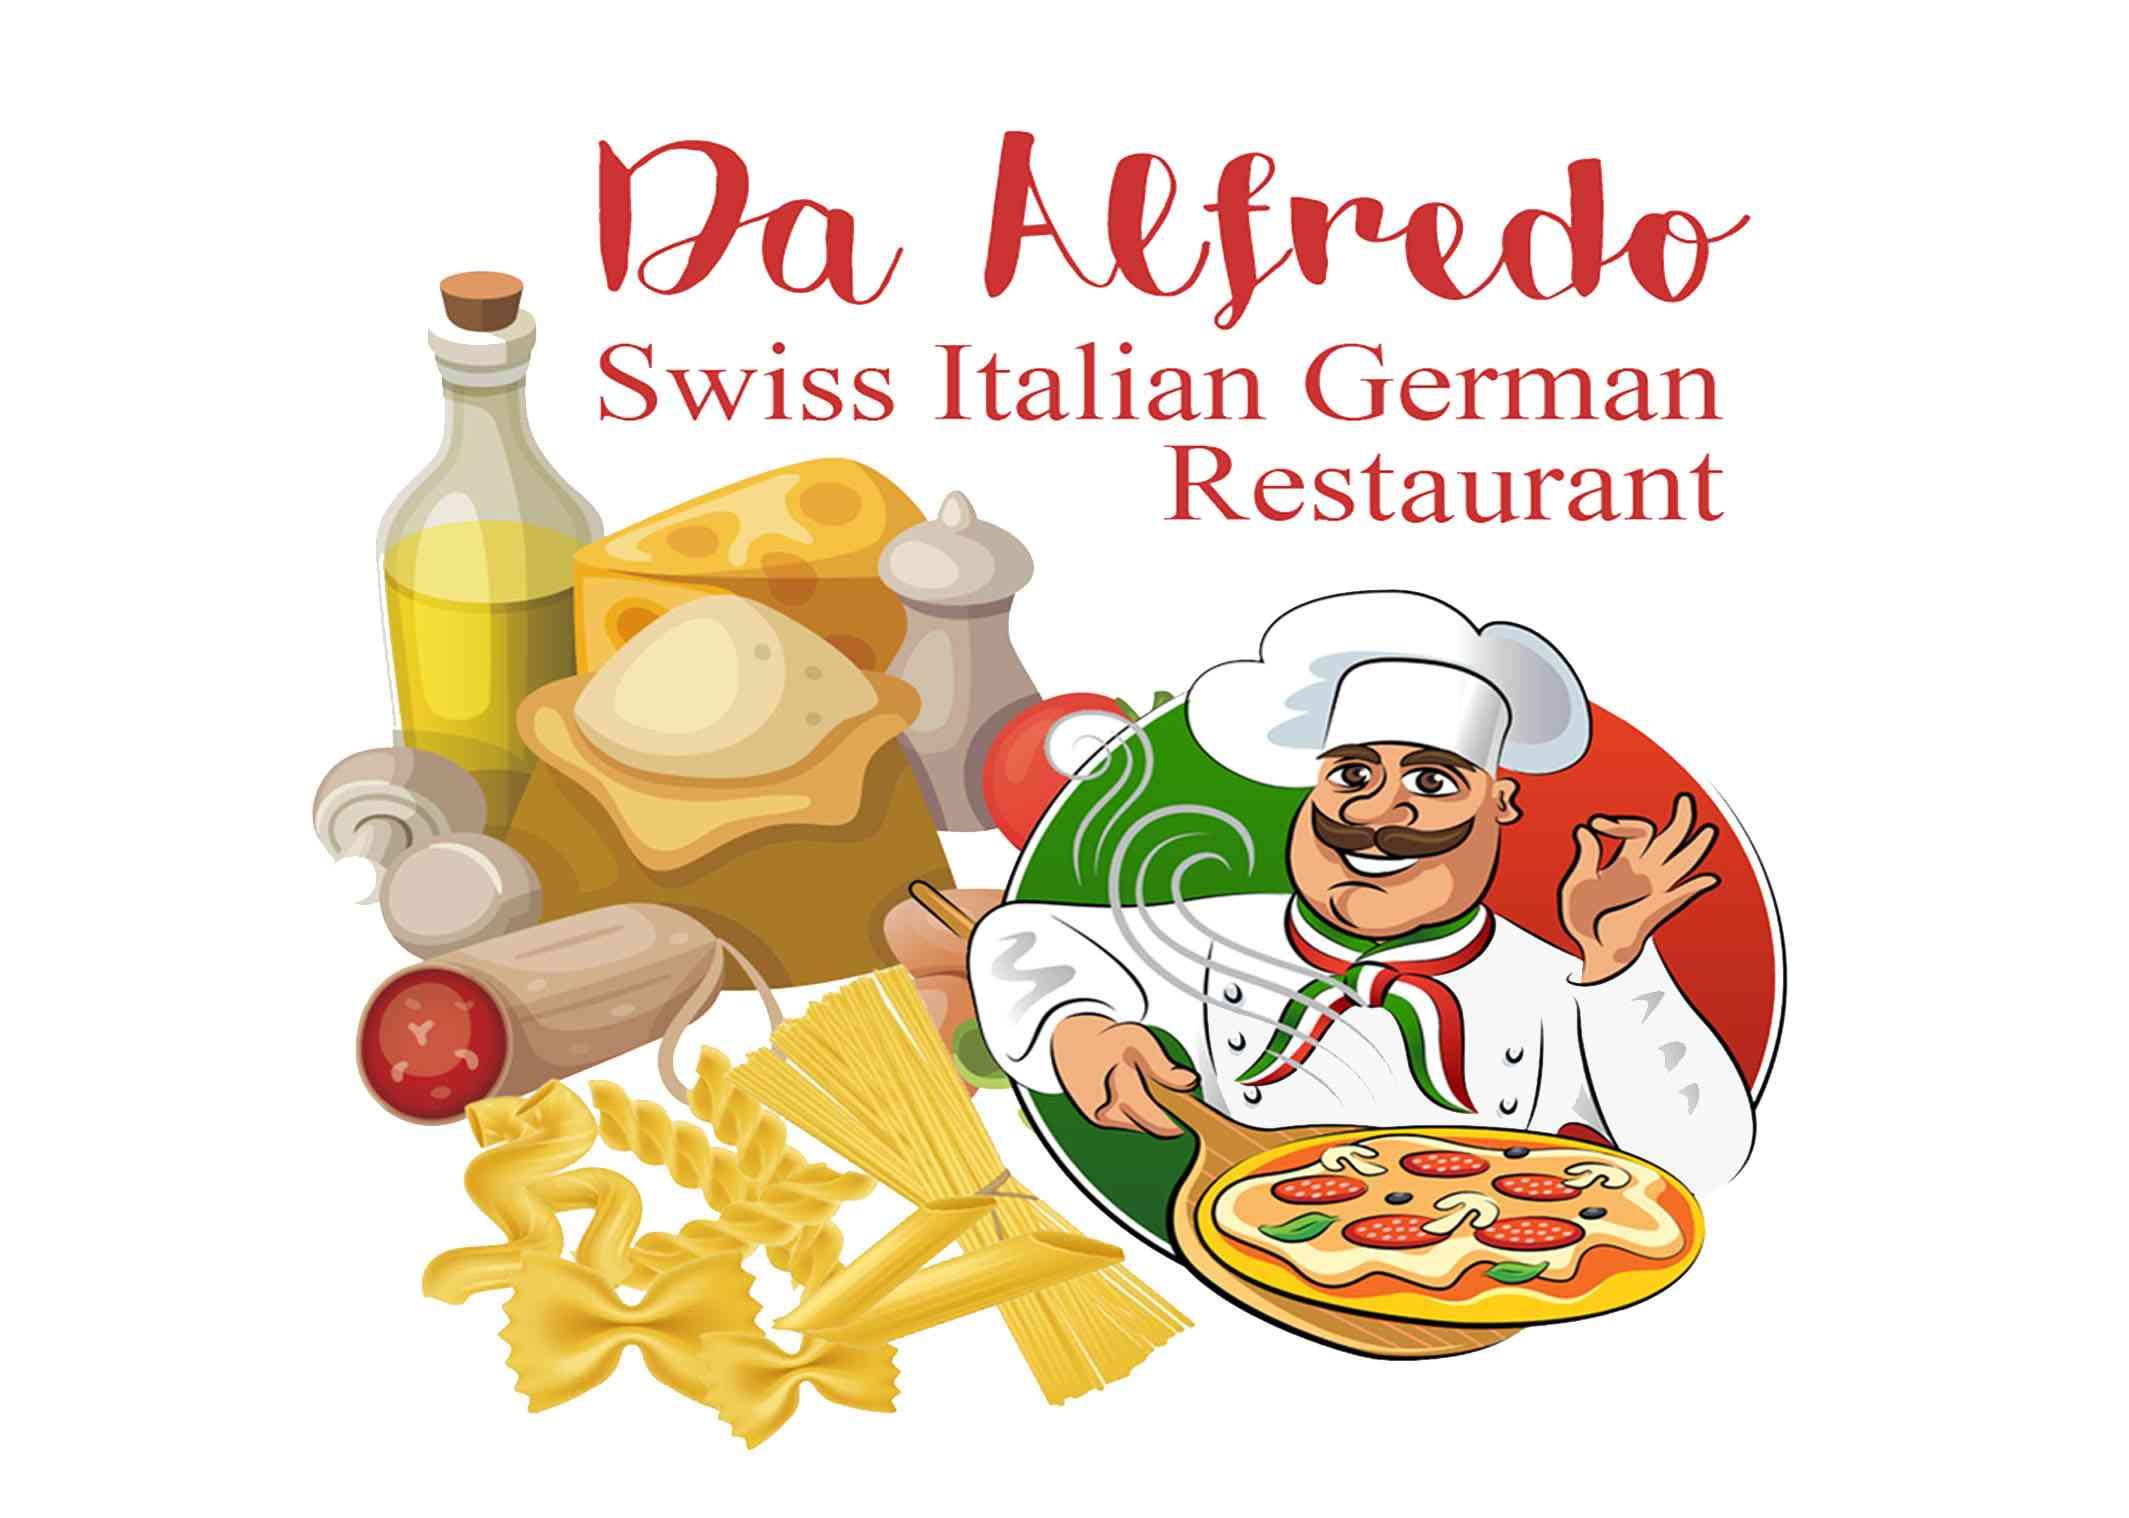 Swiss Italian German Restaurant